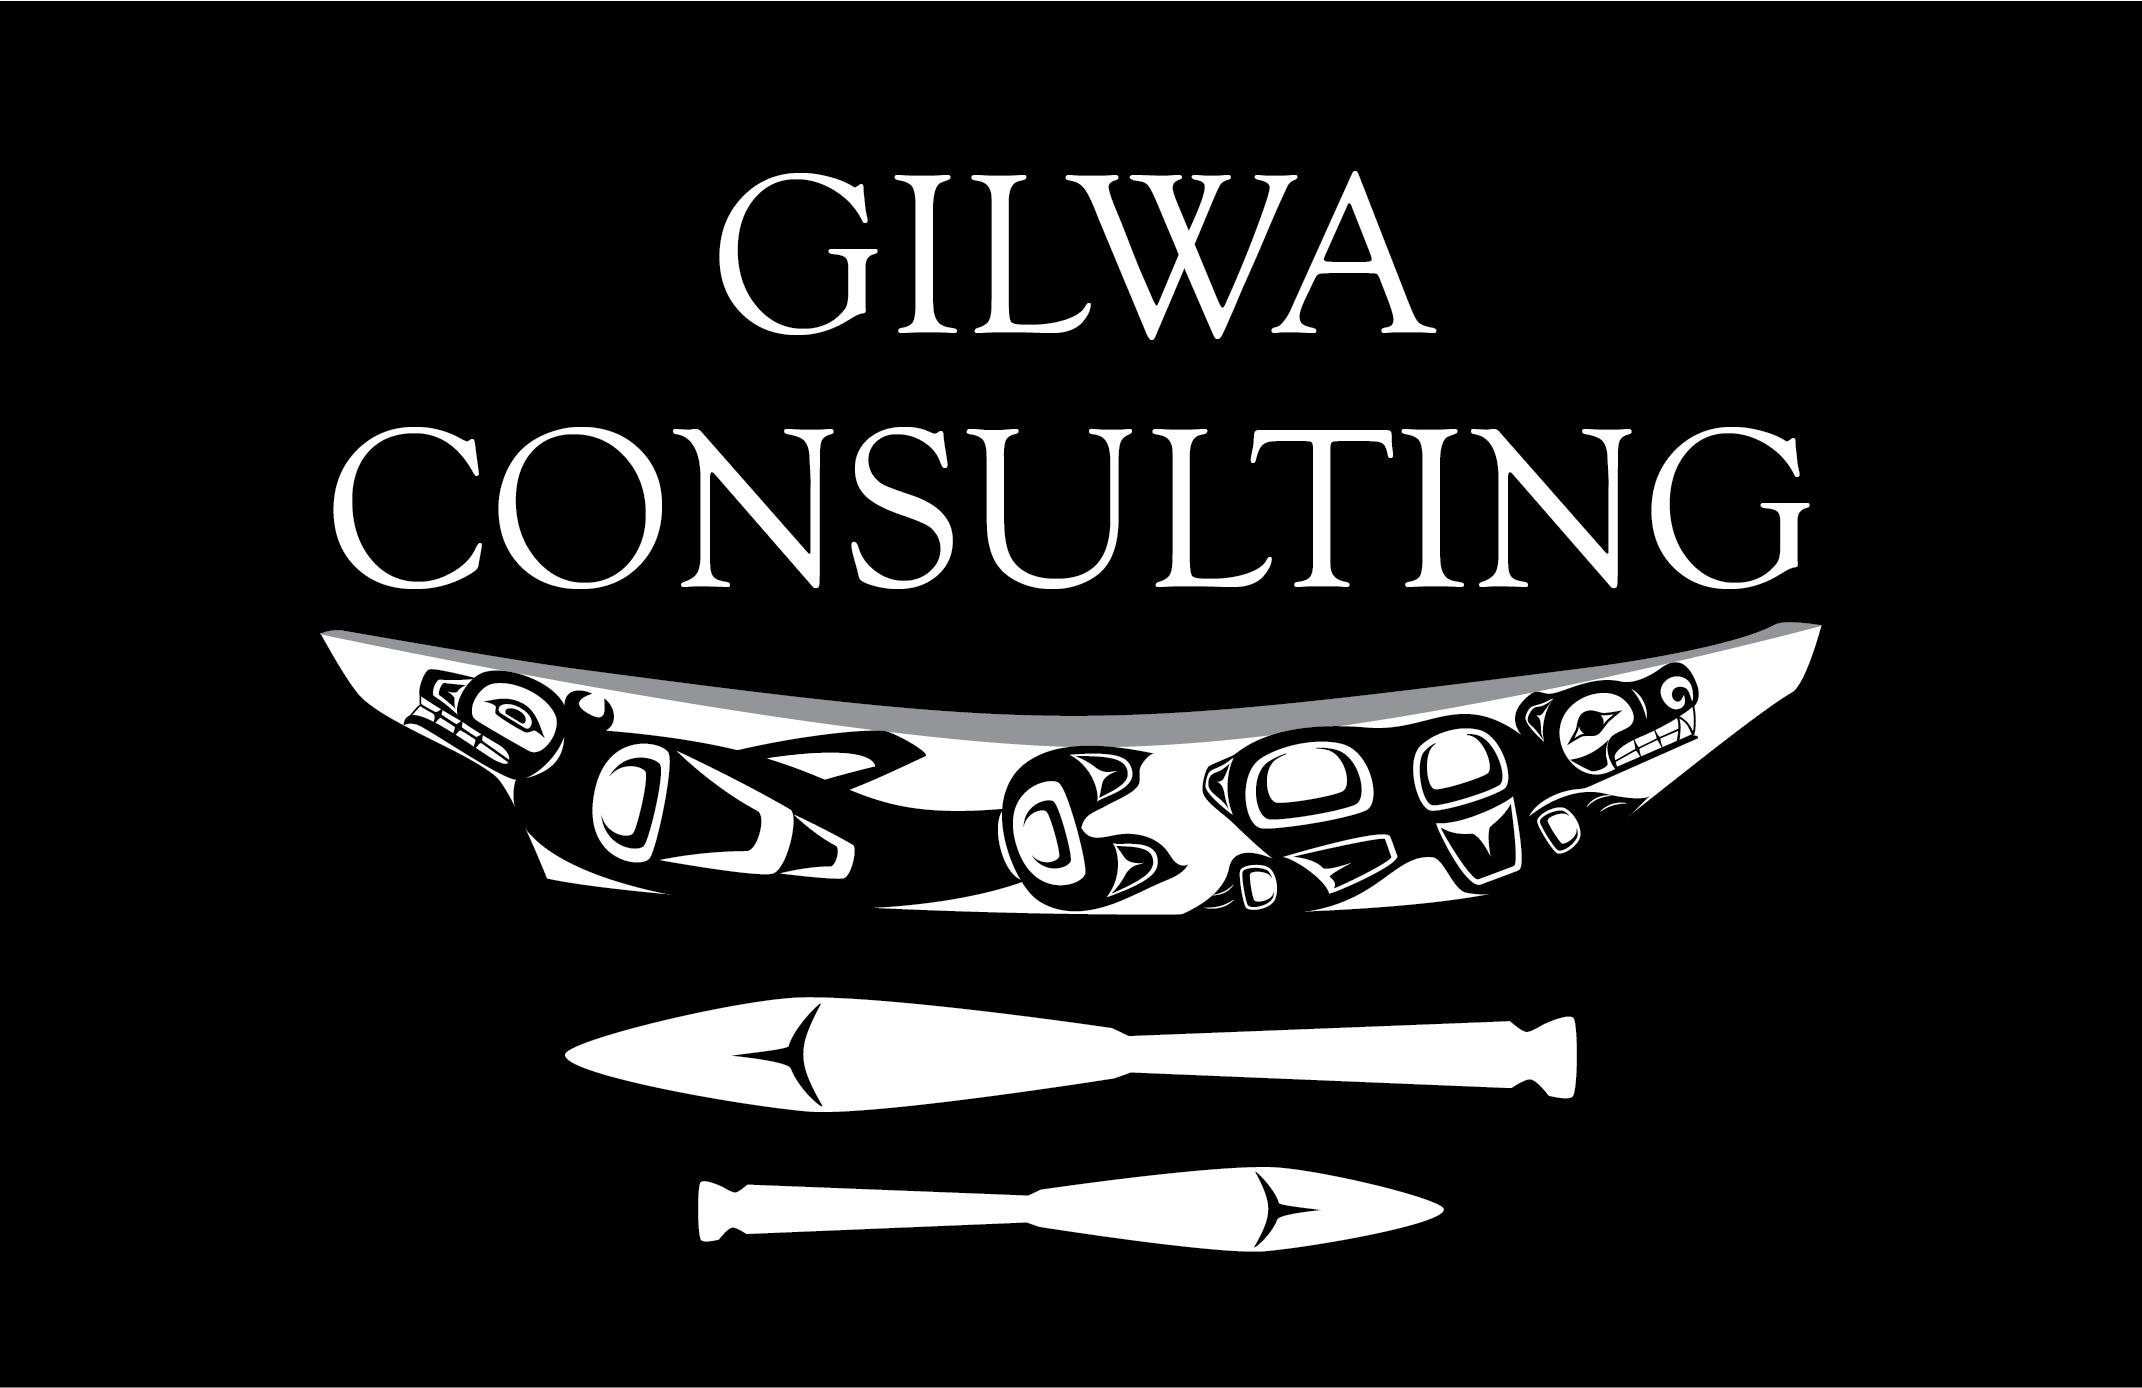 Gilwa Consulting